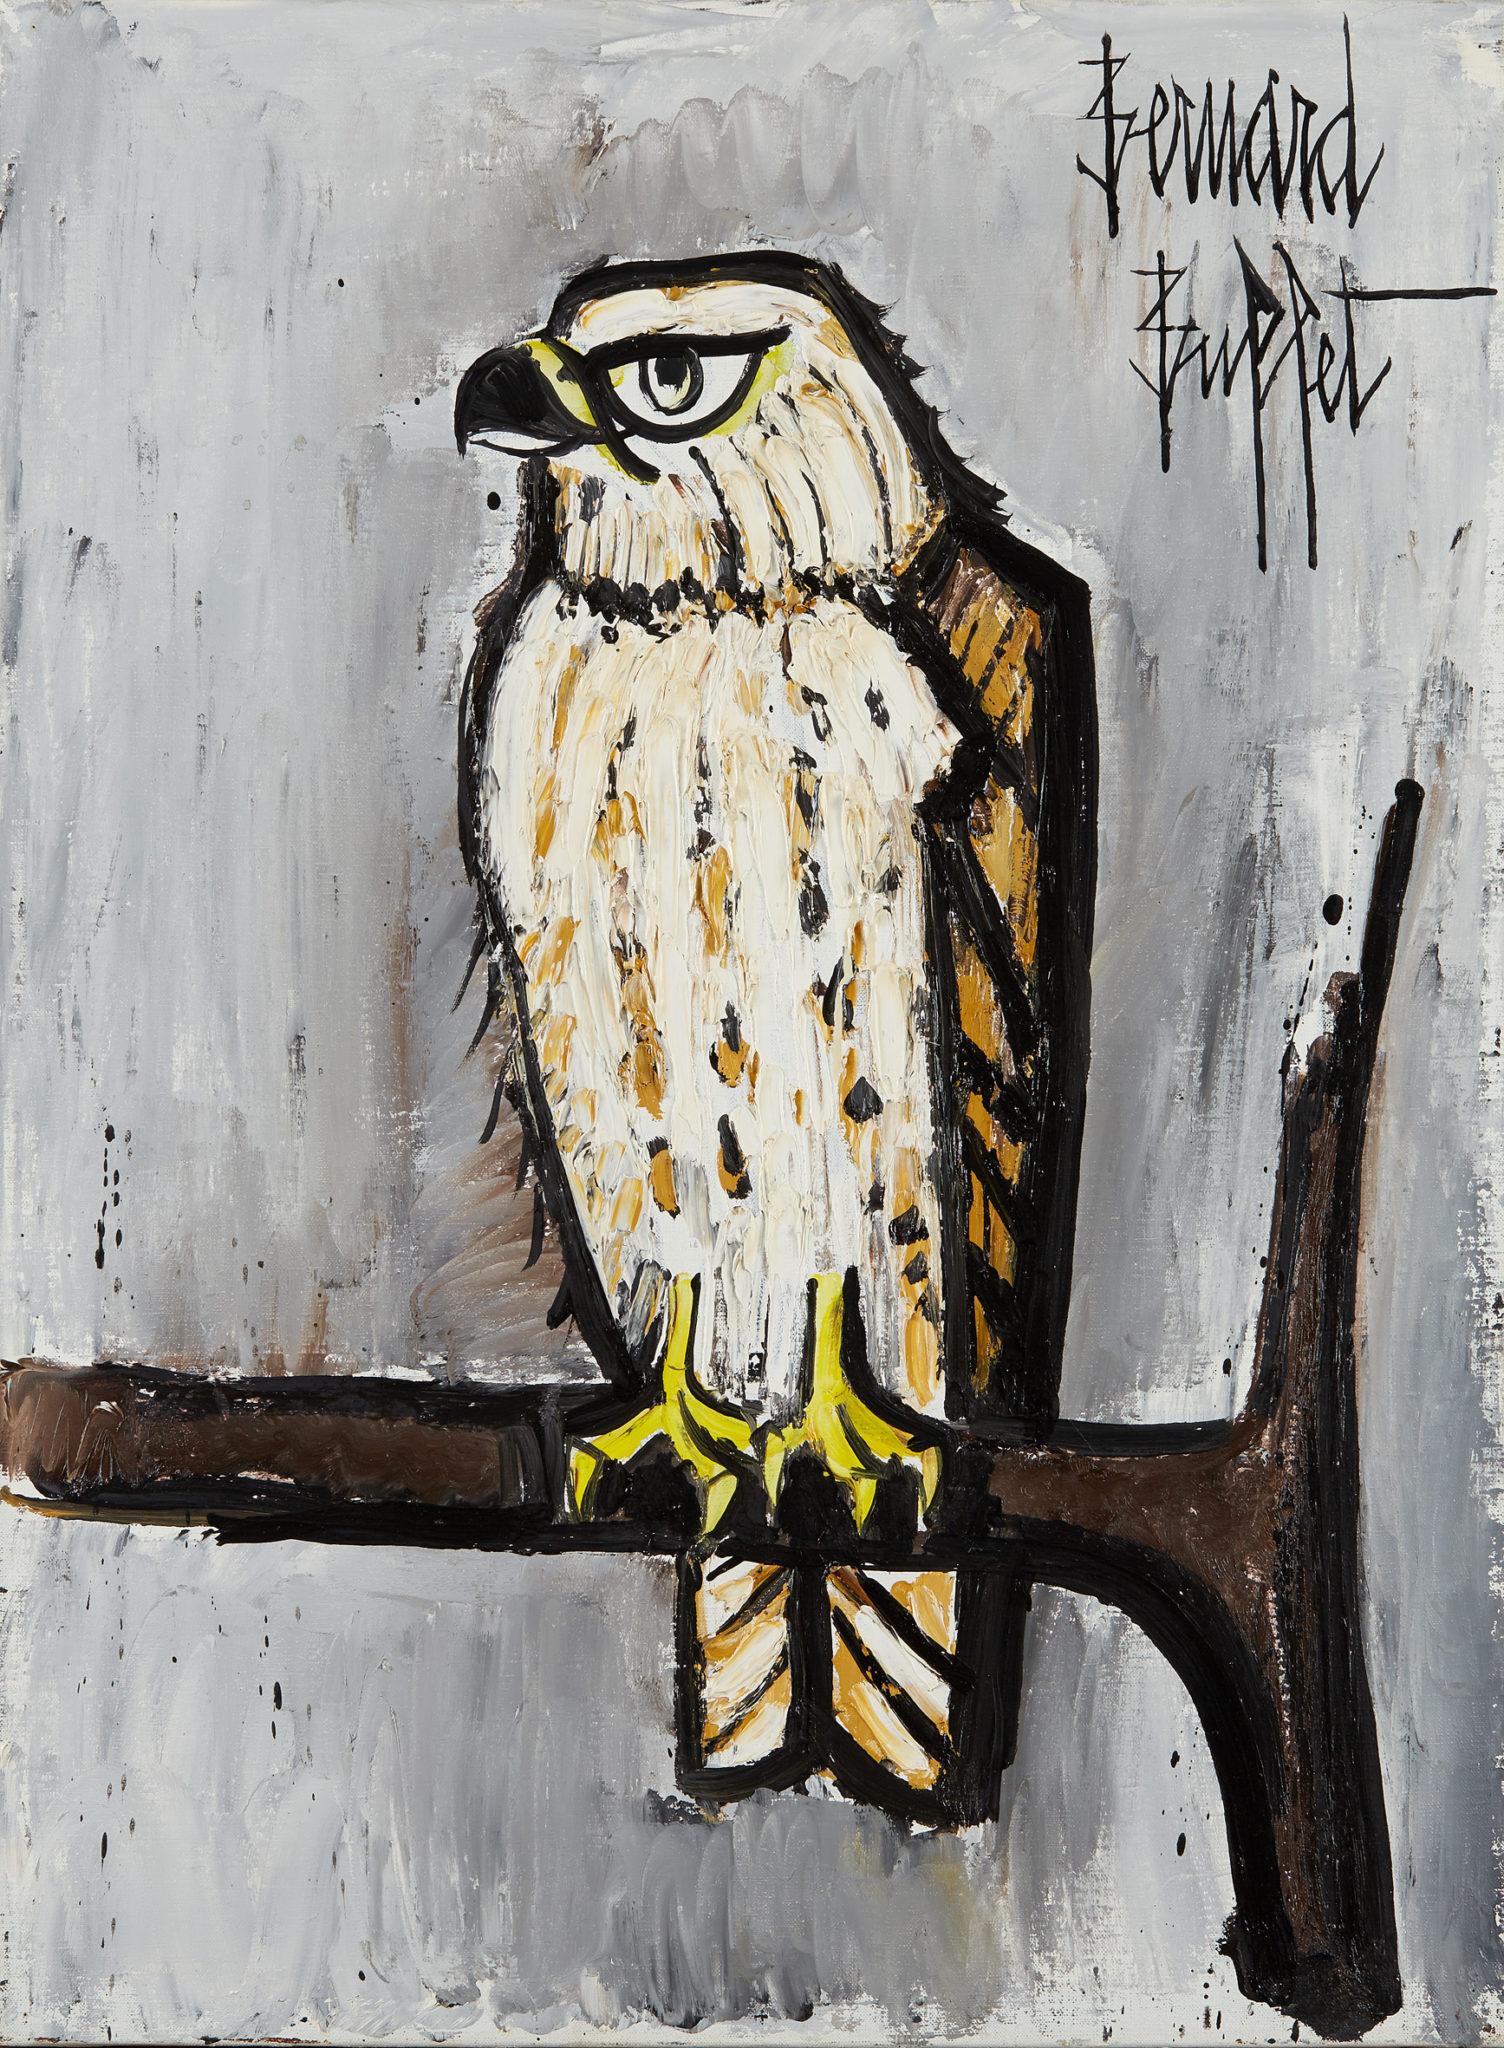 GALERIE JANY JANSEM Bernard BUFFET «Busard», 1995 Huile sur toile 73 x 54 cm Courtesy Galerie Jany Jansem